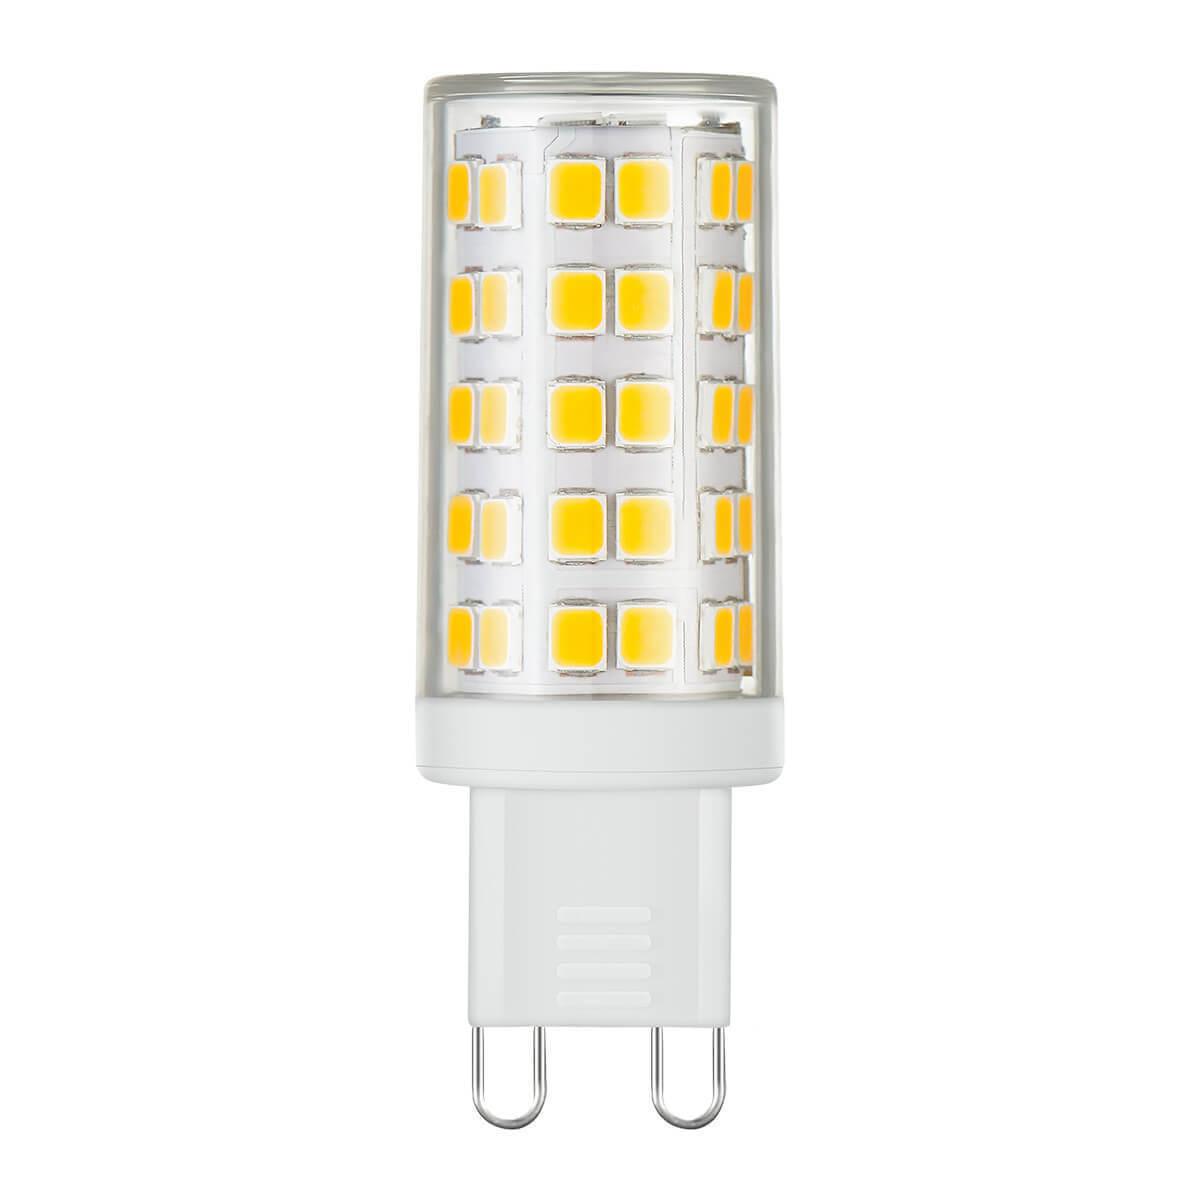 купить Лампа светодиодная Elektrostandard G9 9W 4200K прозрачная 4690389113017 по цене 267 рублей